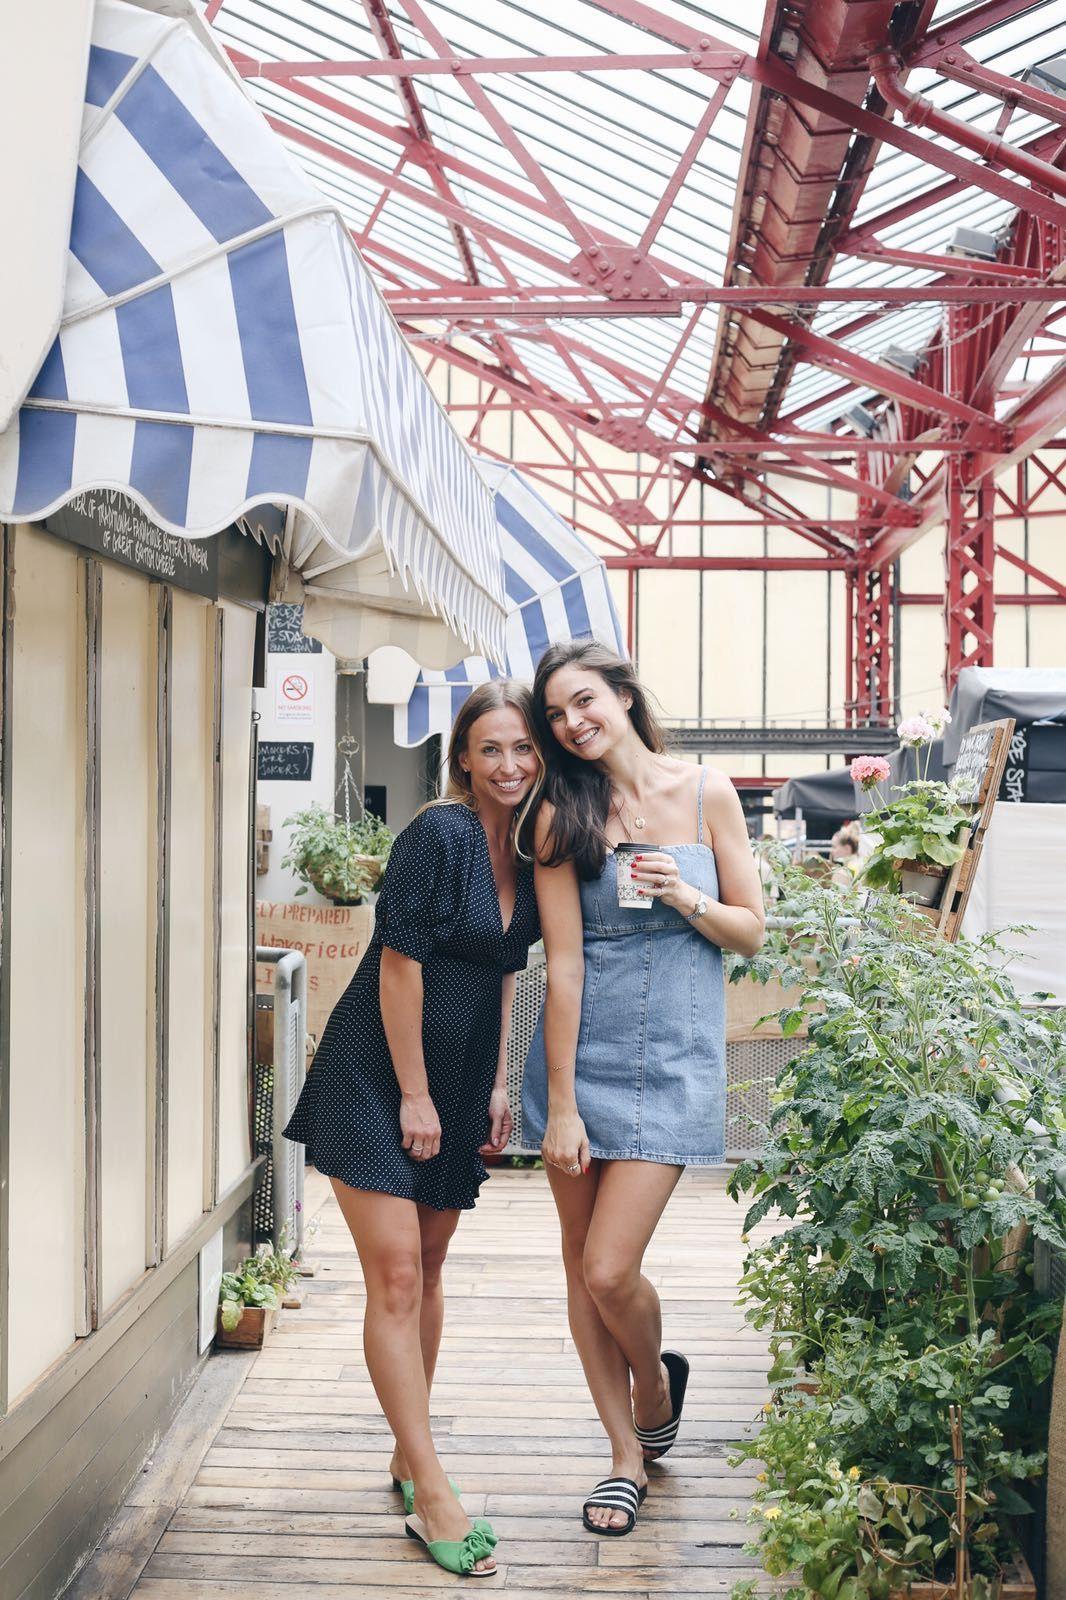 Lauren Webber and Jessica Lawes